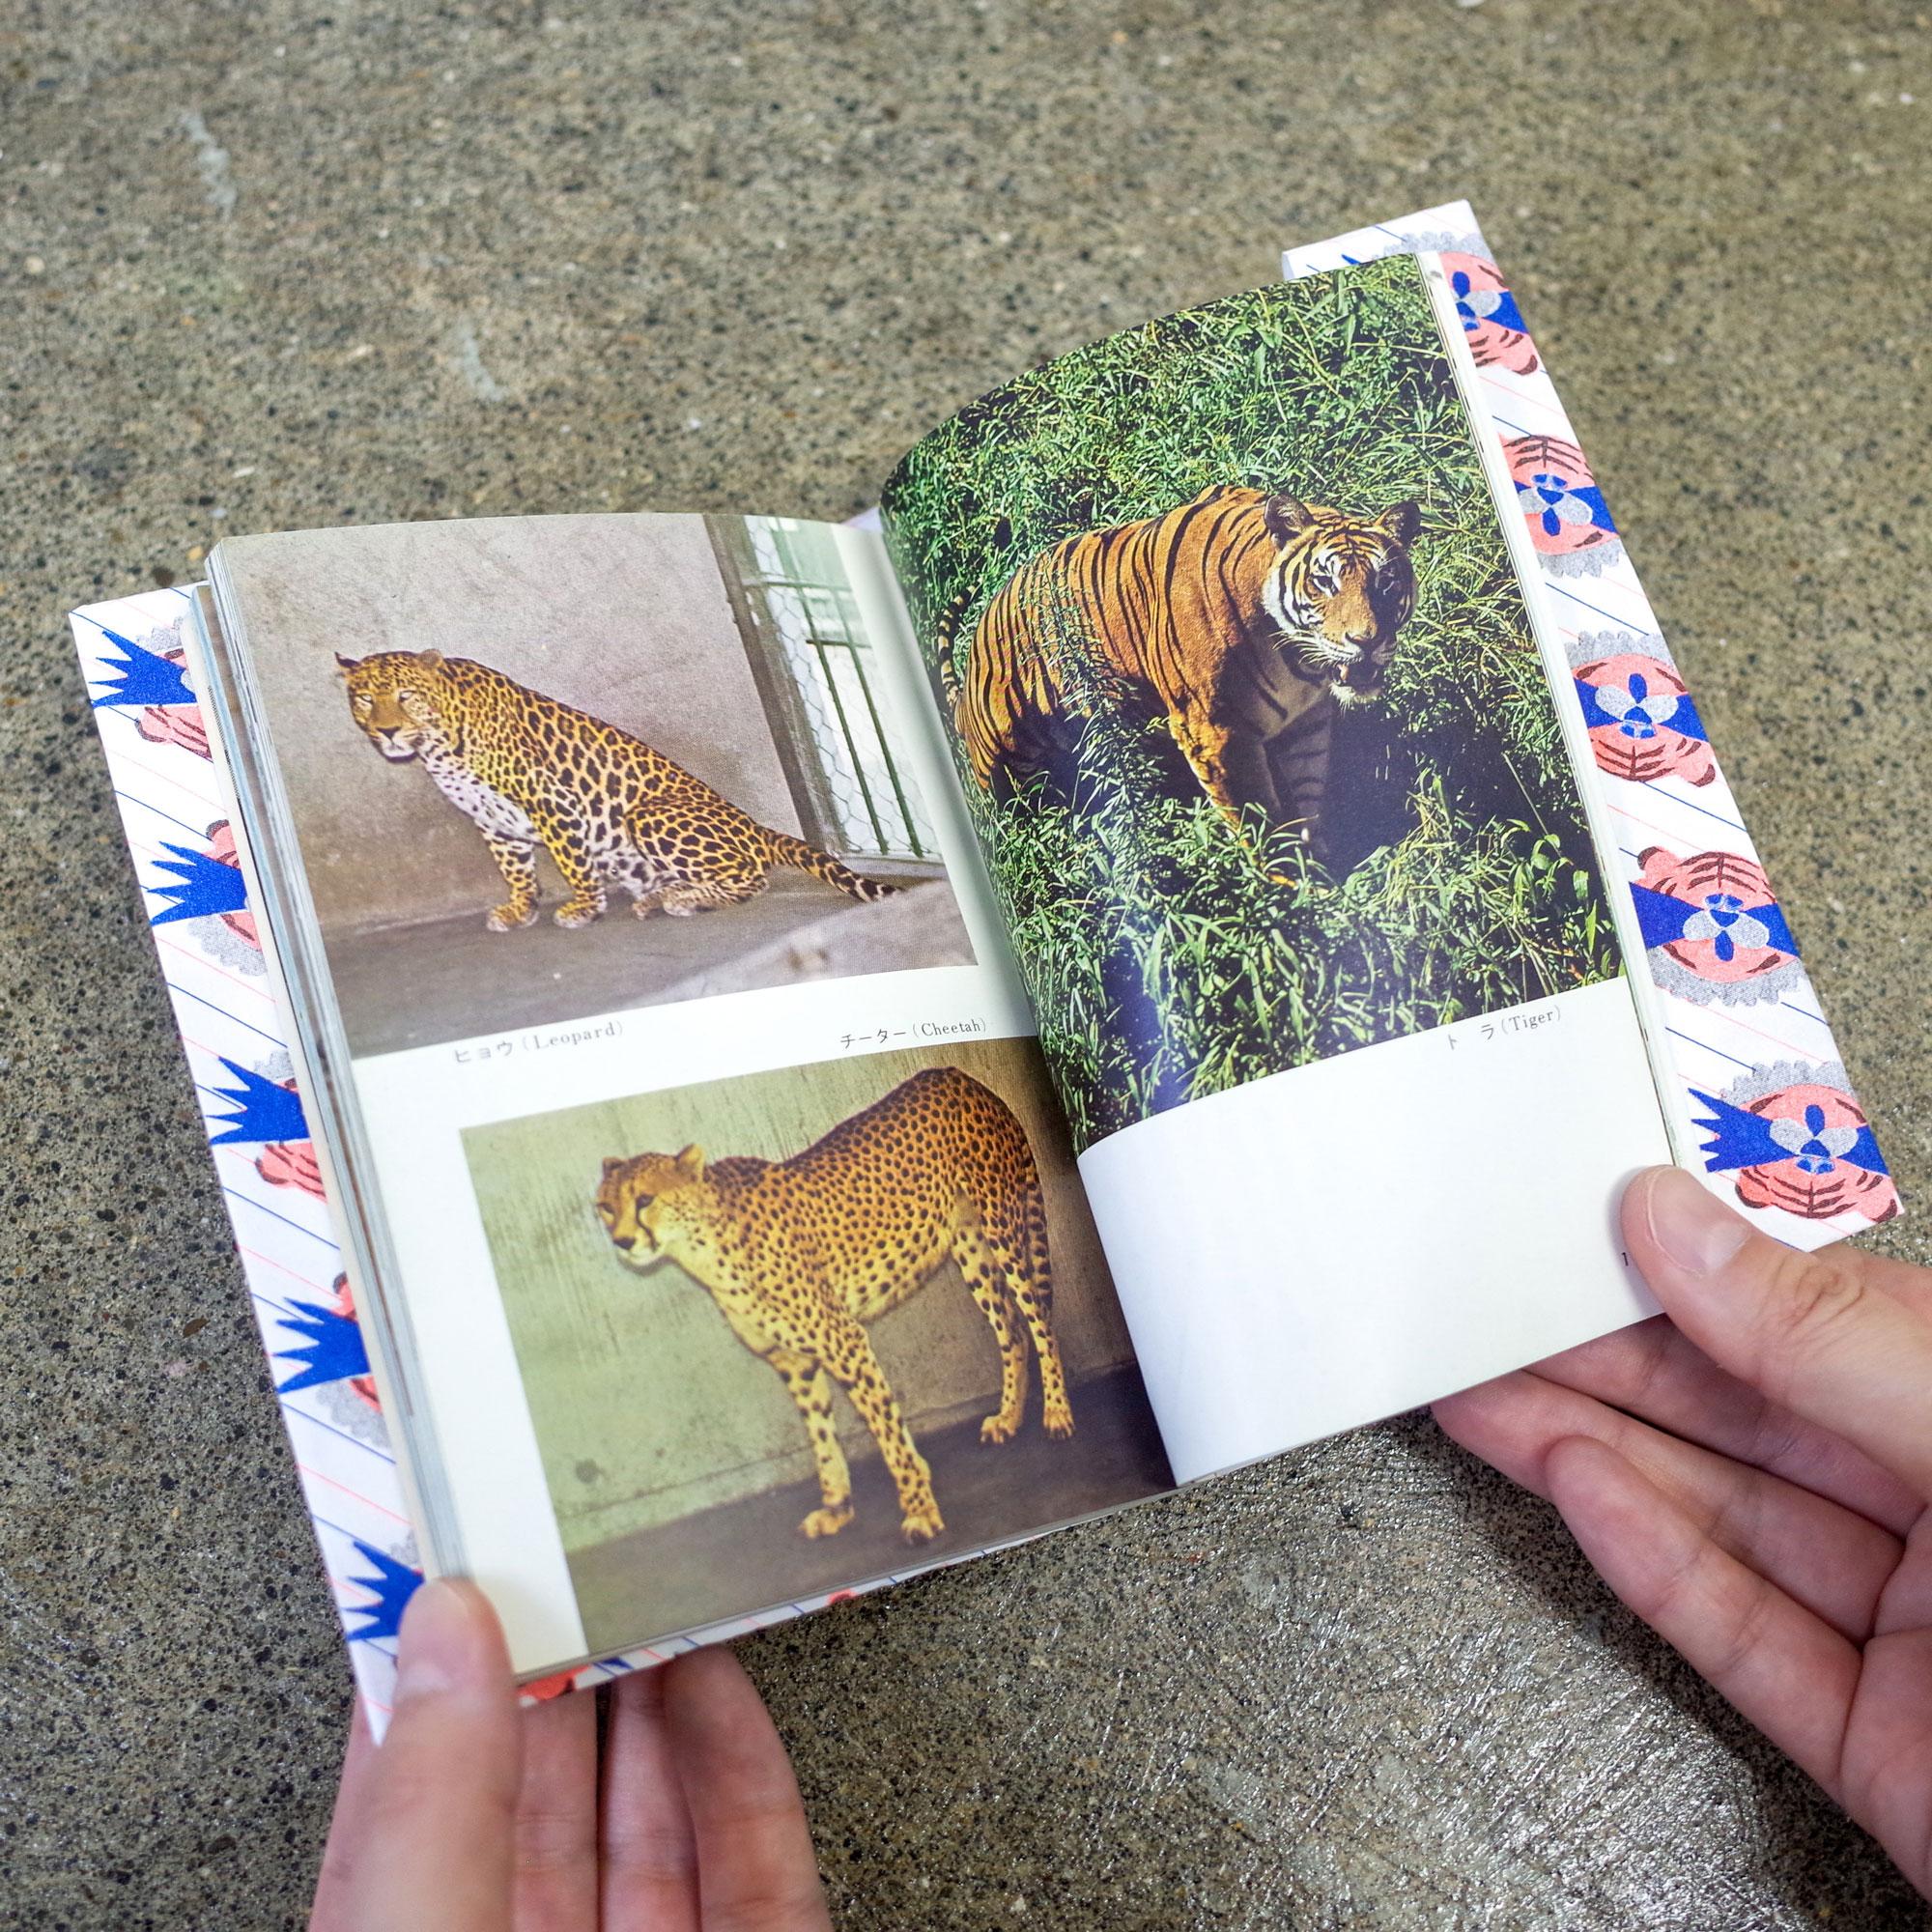 【MAMESUKI パターンペーパー活用法】ブックカバーの折り方